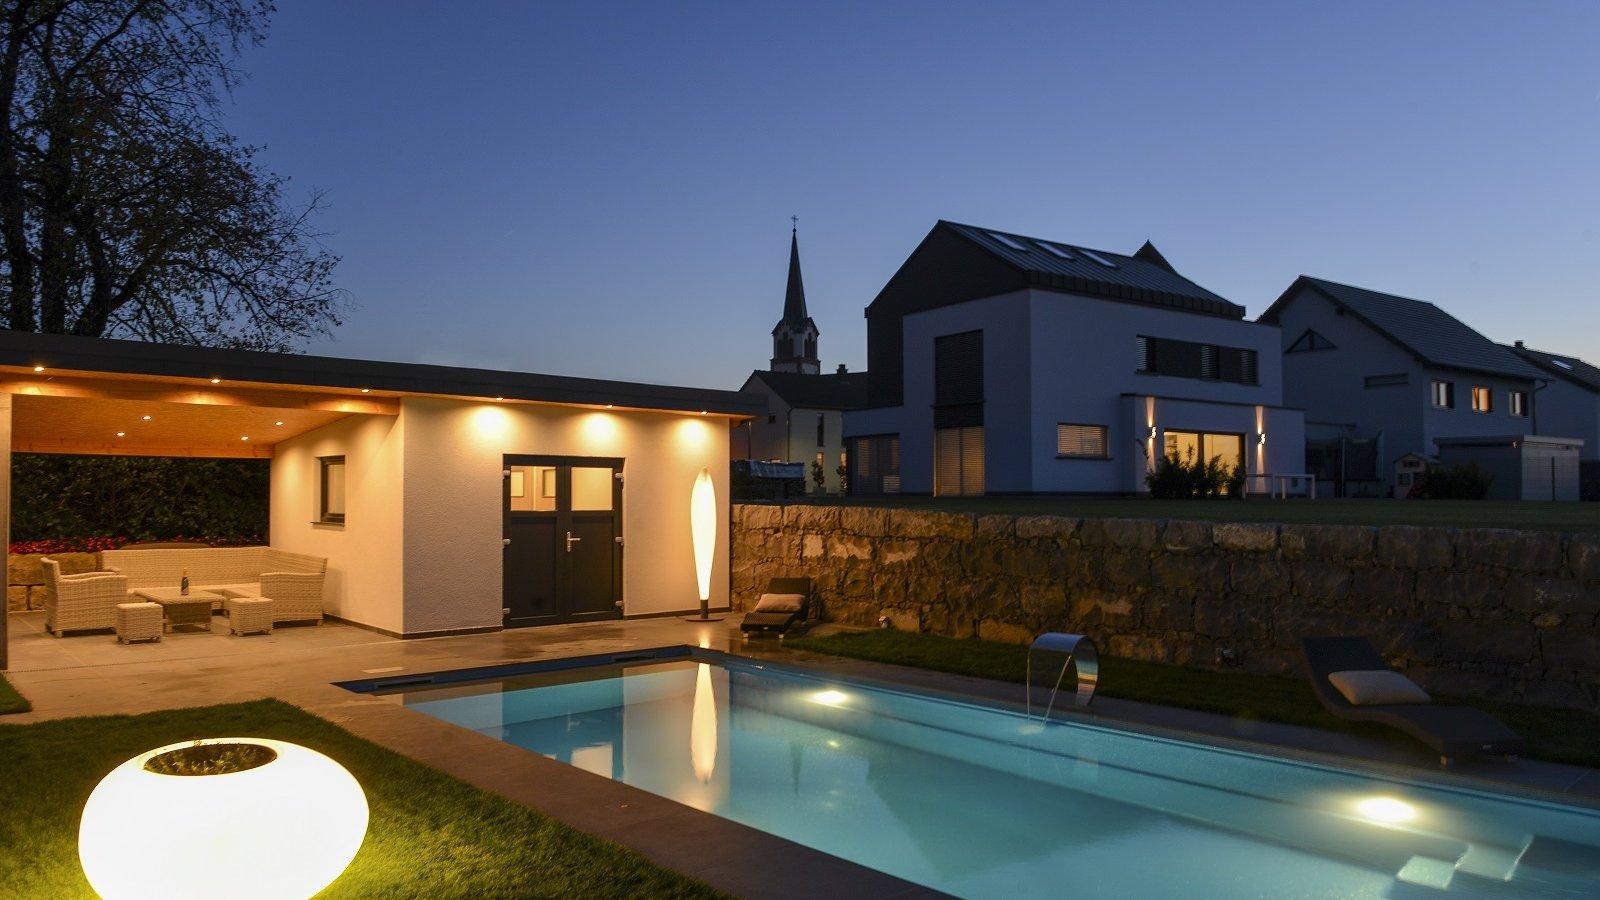 Schwimmbadbau in Trier, Saunabau, Whirlpools, Pools, Schwimmbad ...